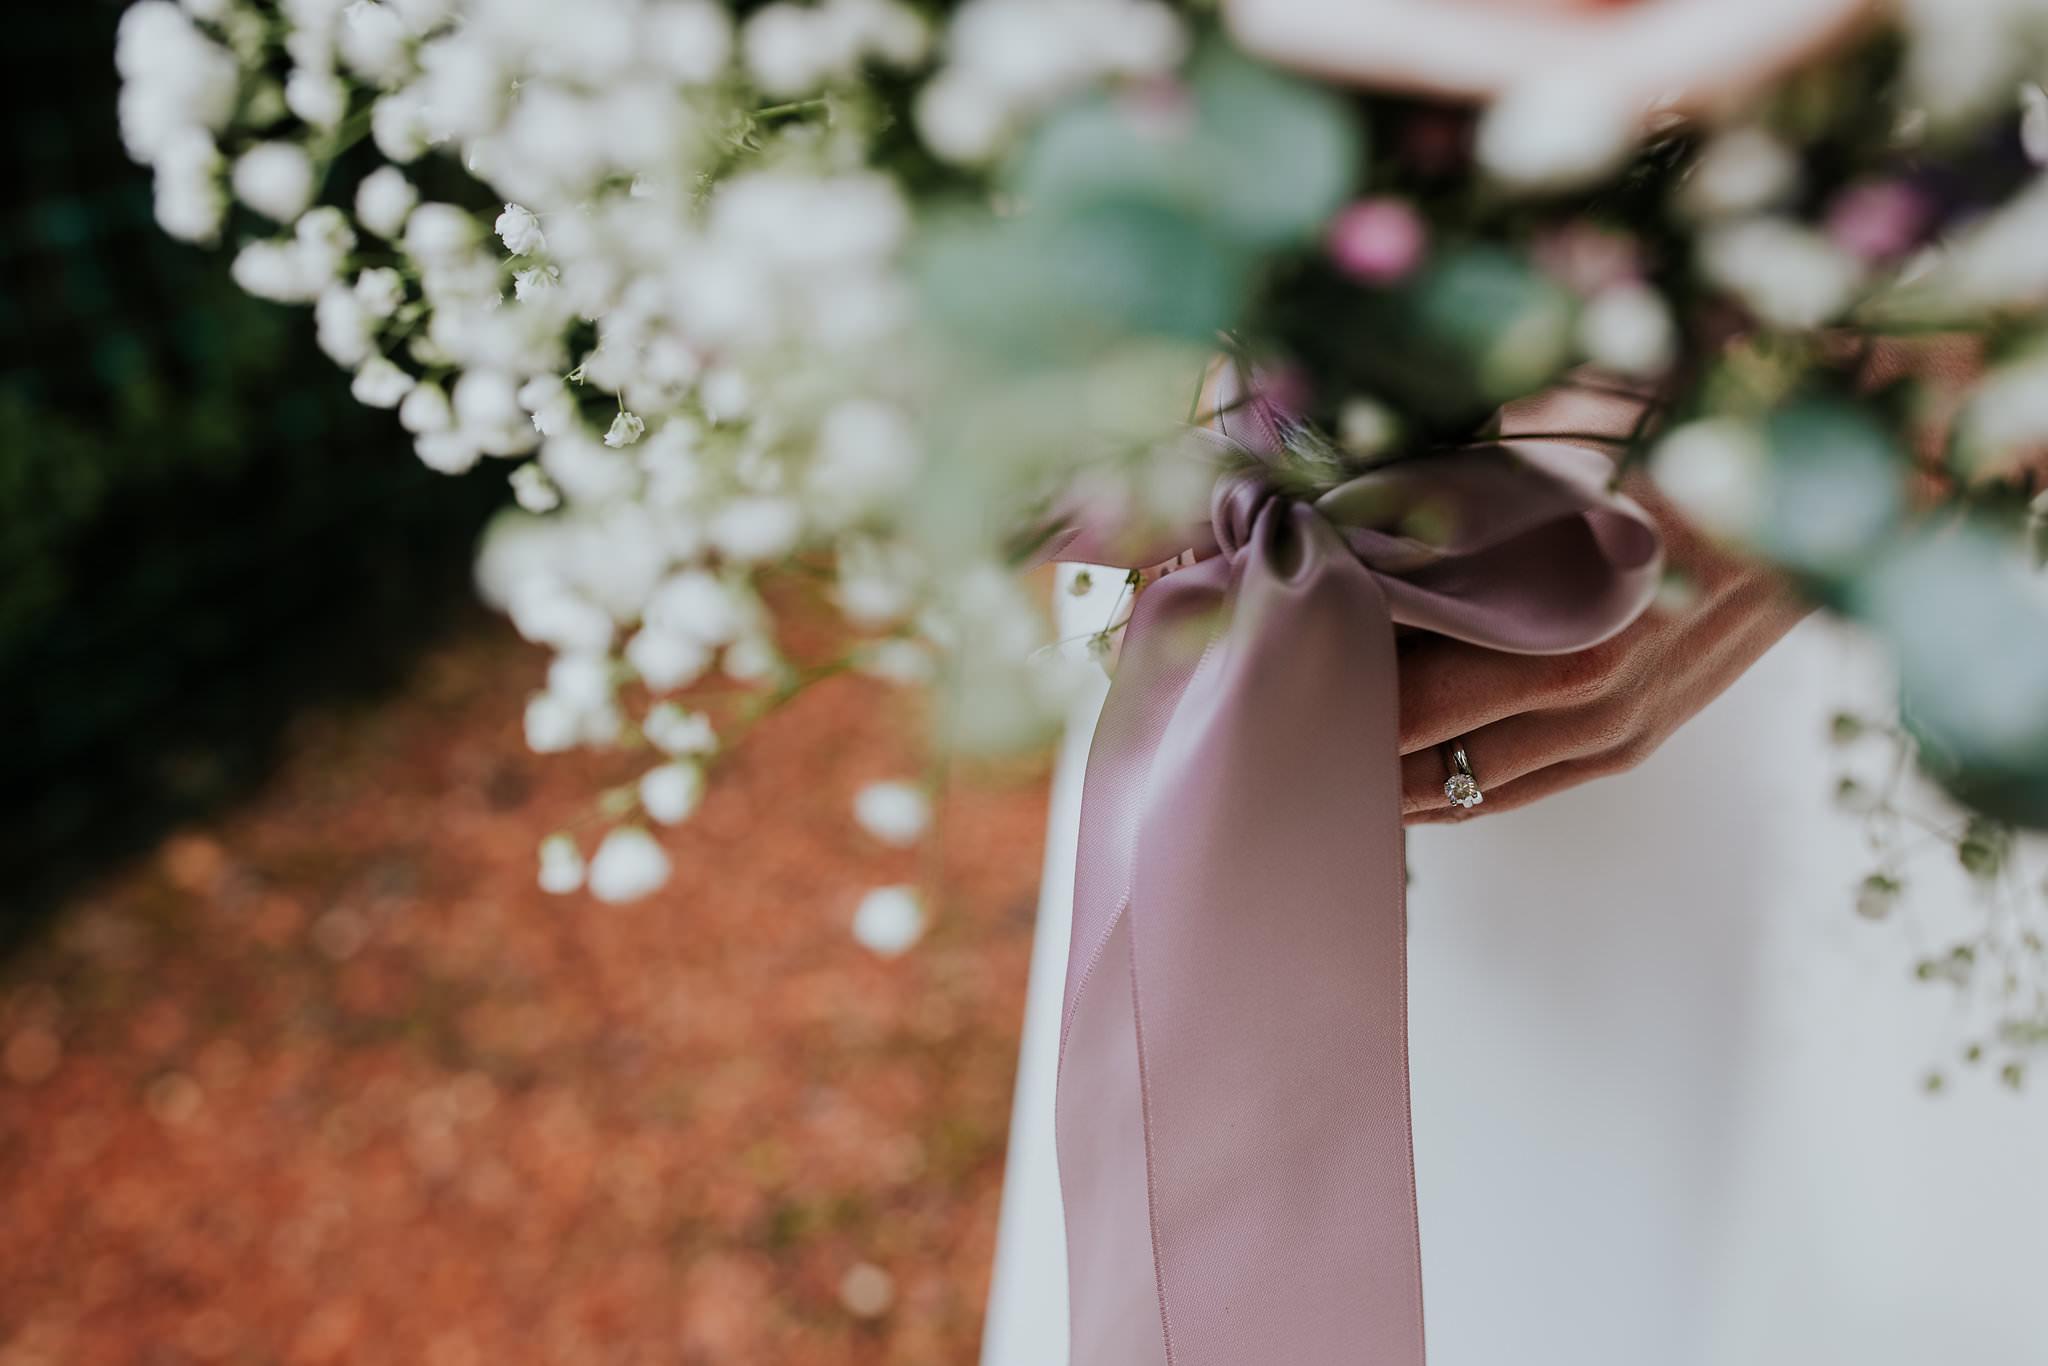 kirknewton stables wedding photographer (54).jpg